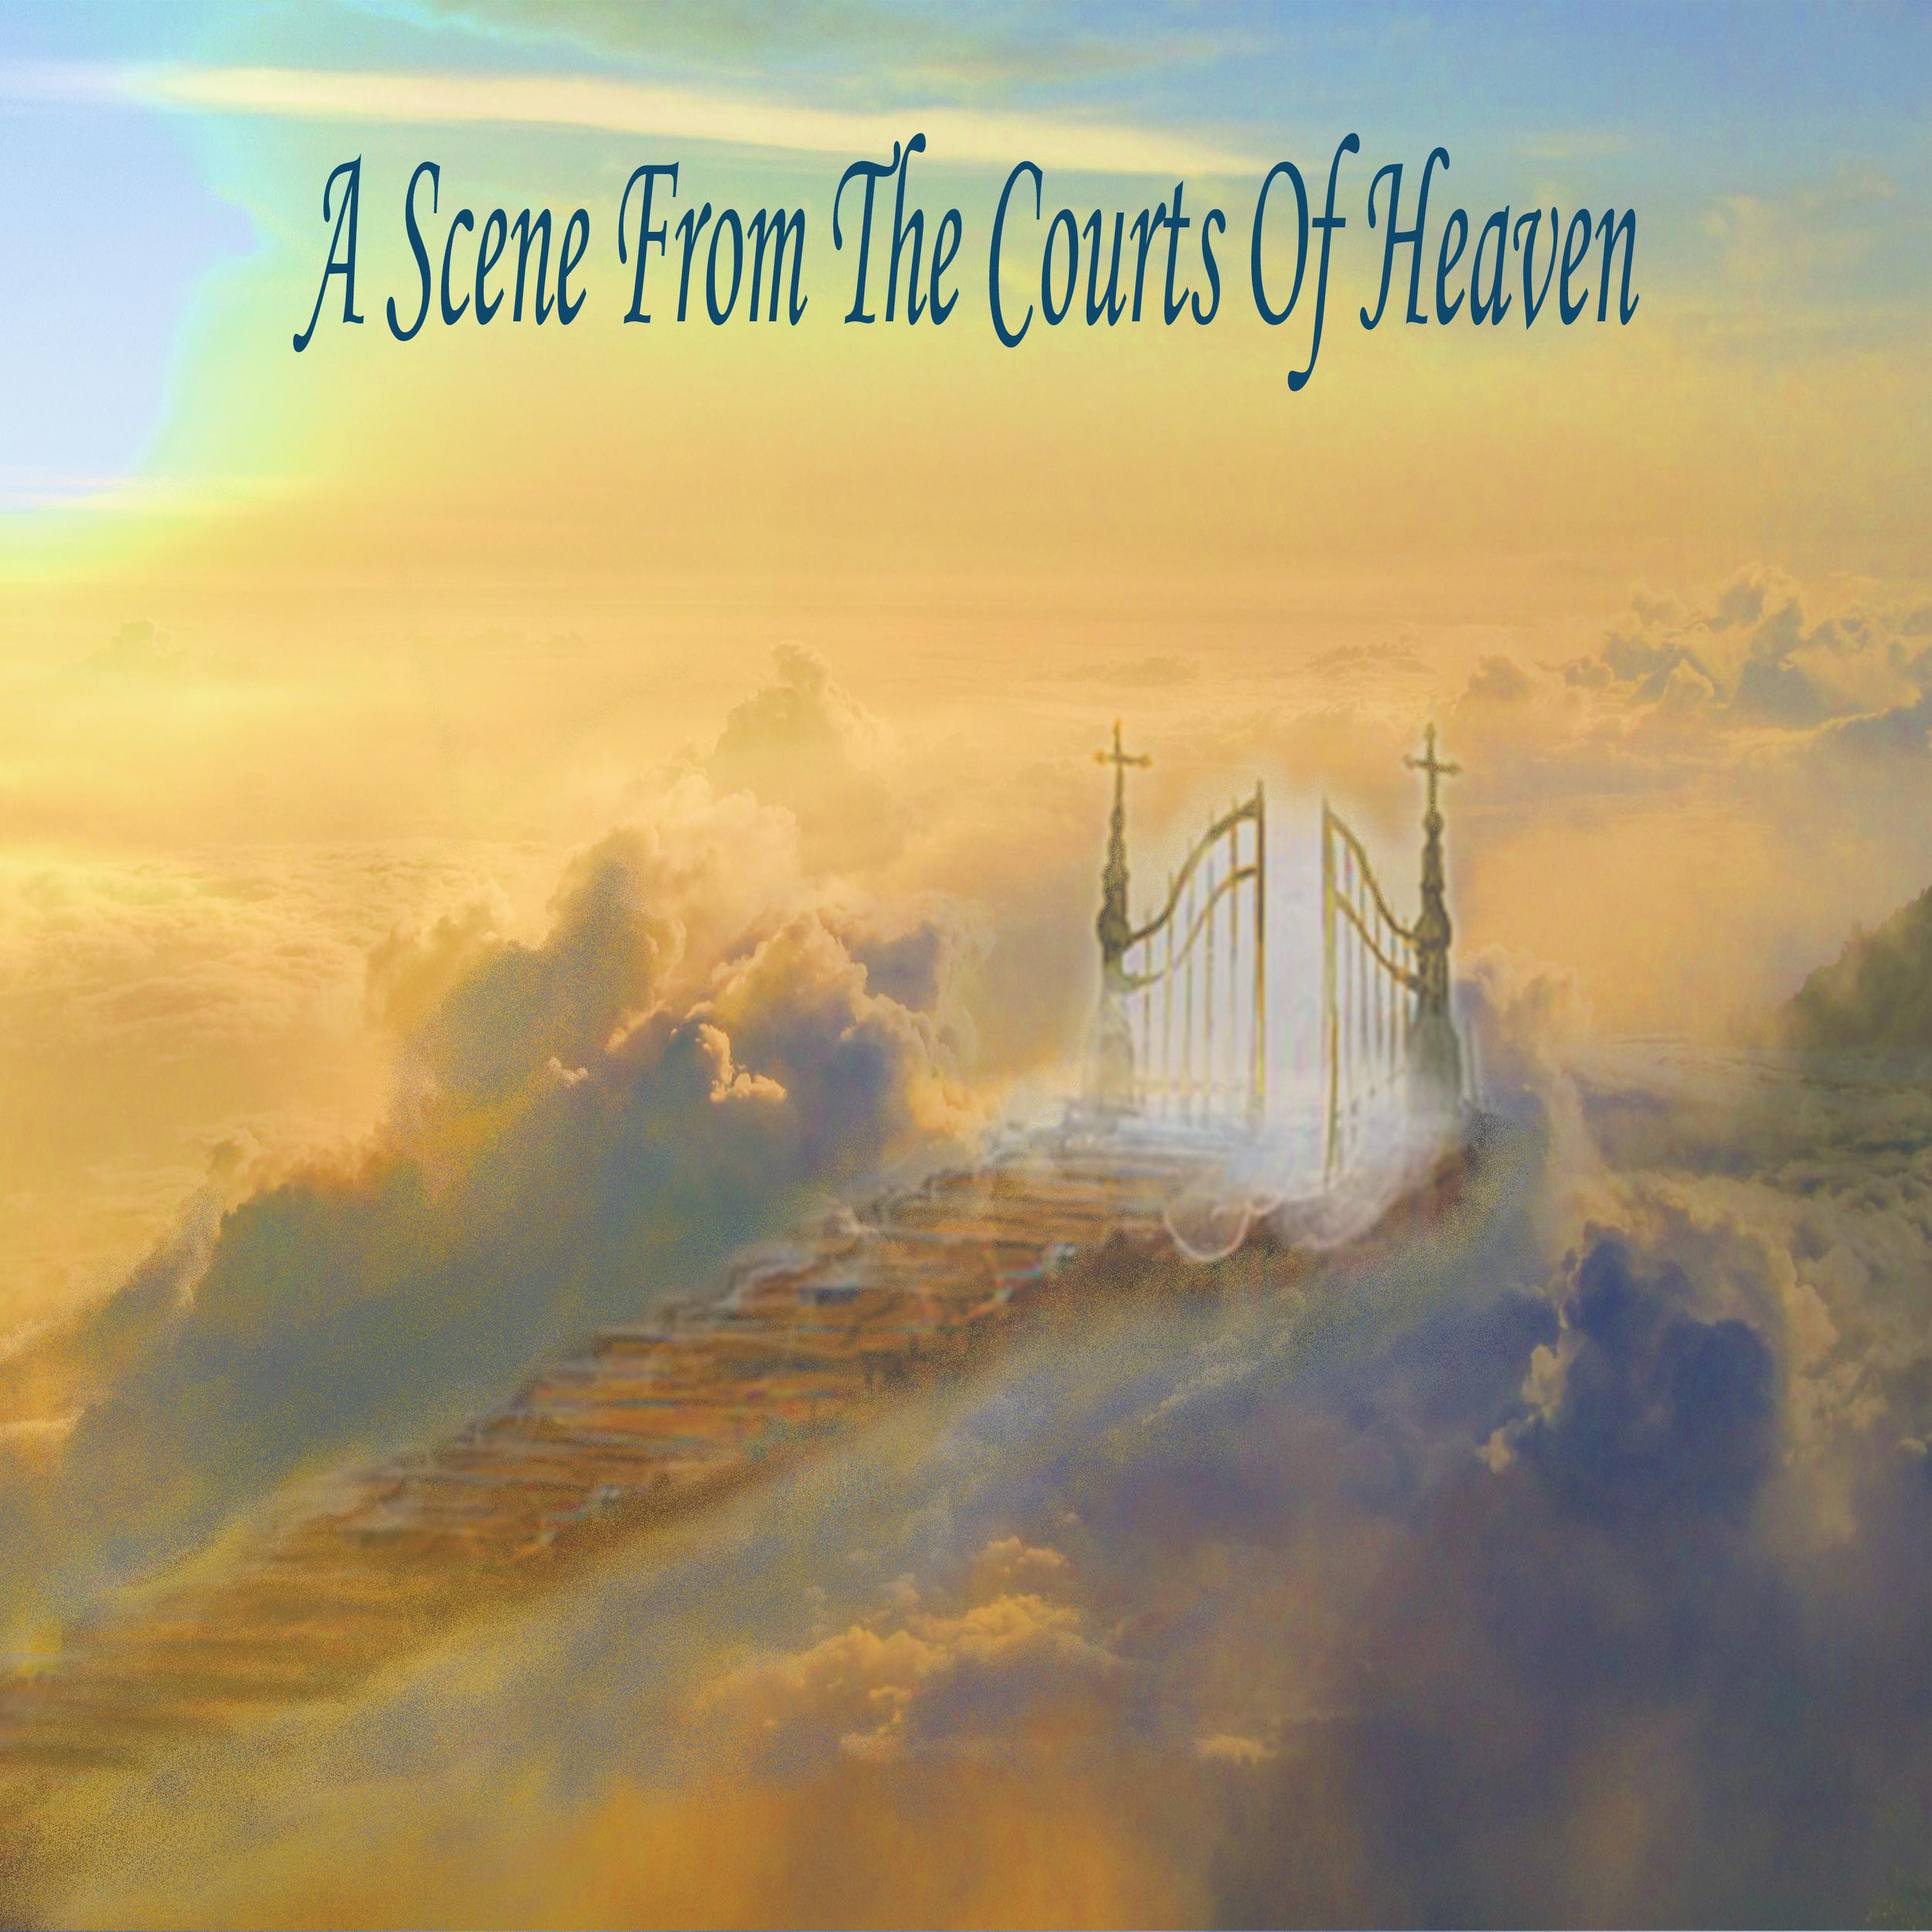 A Scene From The Courts of Heaven (Audio Sermon CD) — Louada Raschke  Ministries